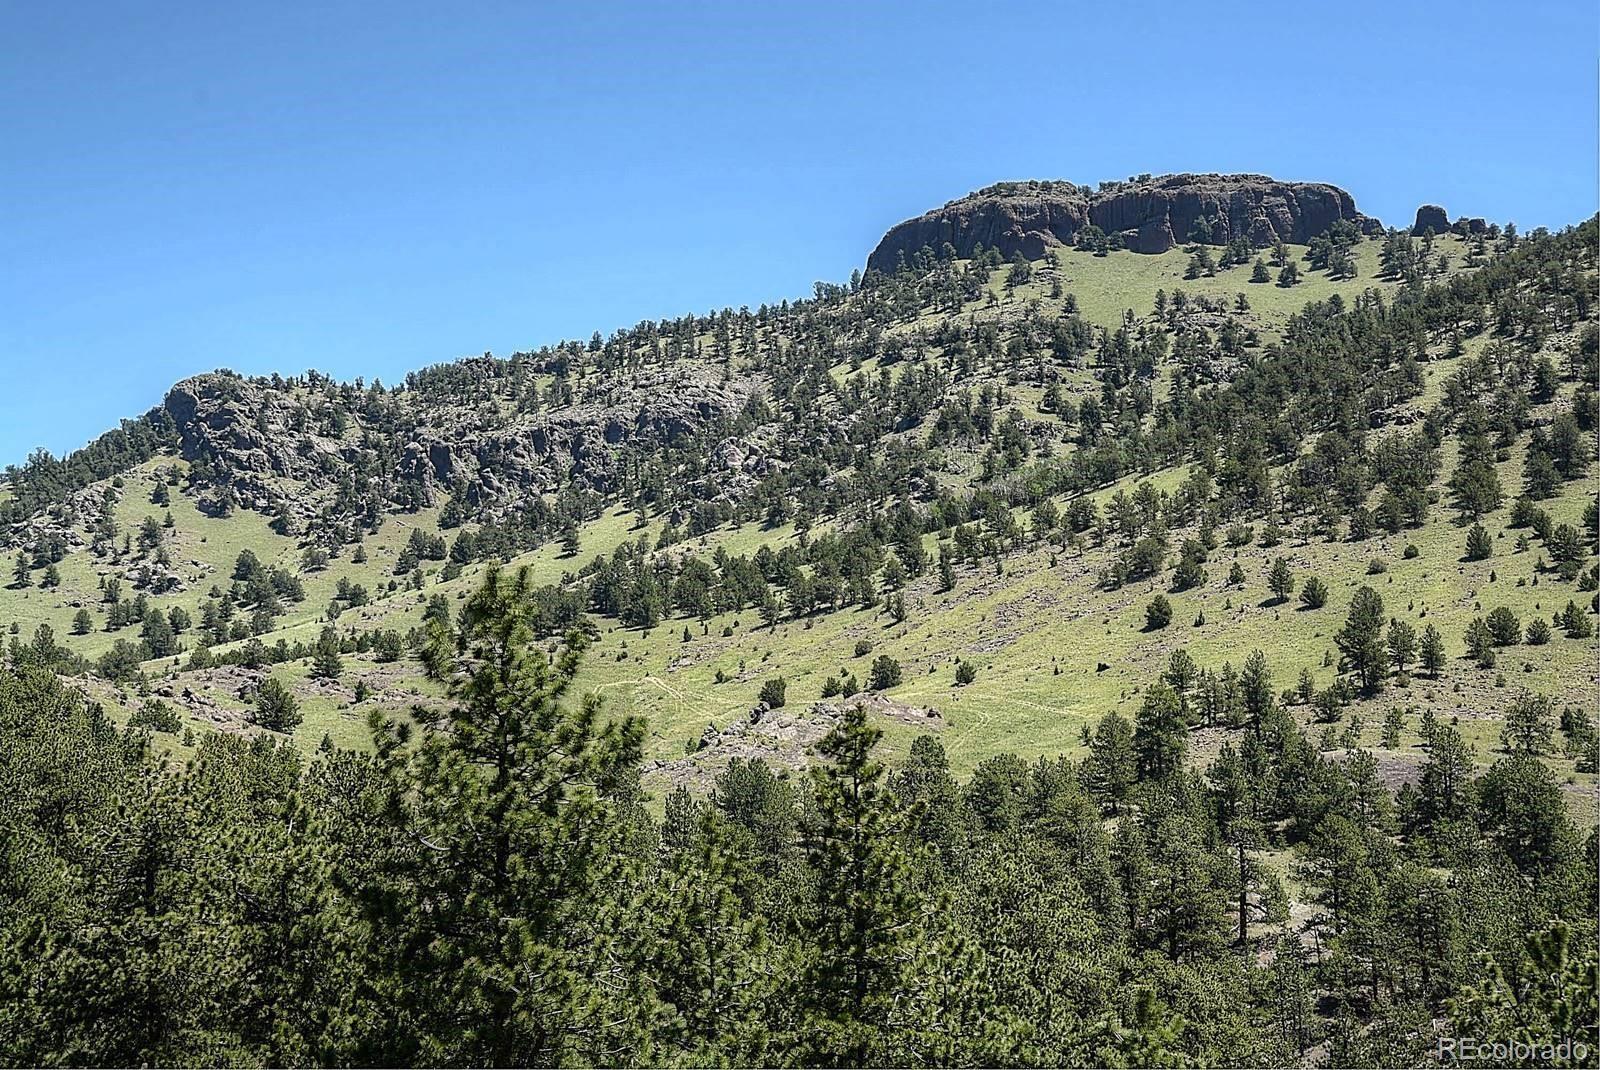 MLS# 8182693 - 35 - 396 Eagle Nest Trail, Guffey, CO 80820